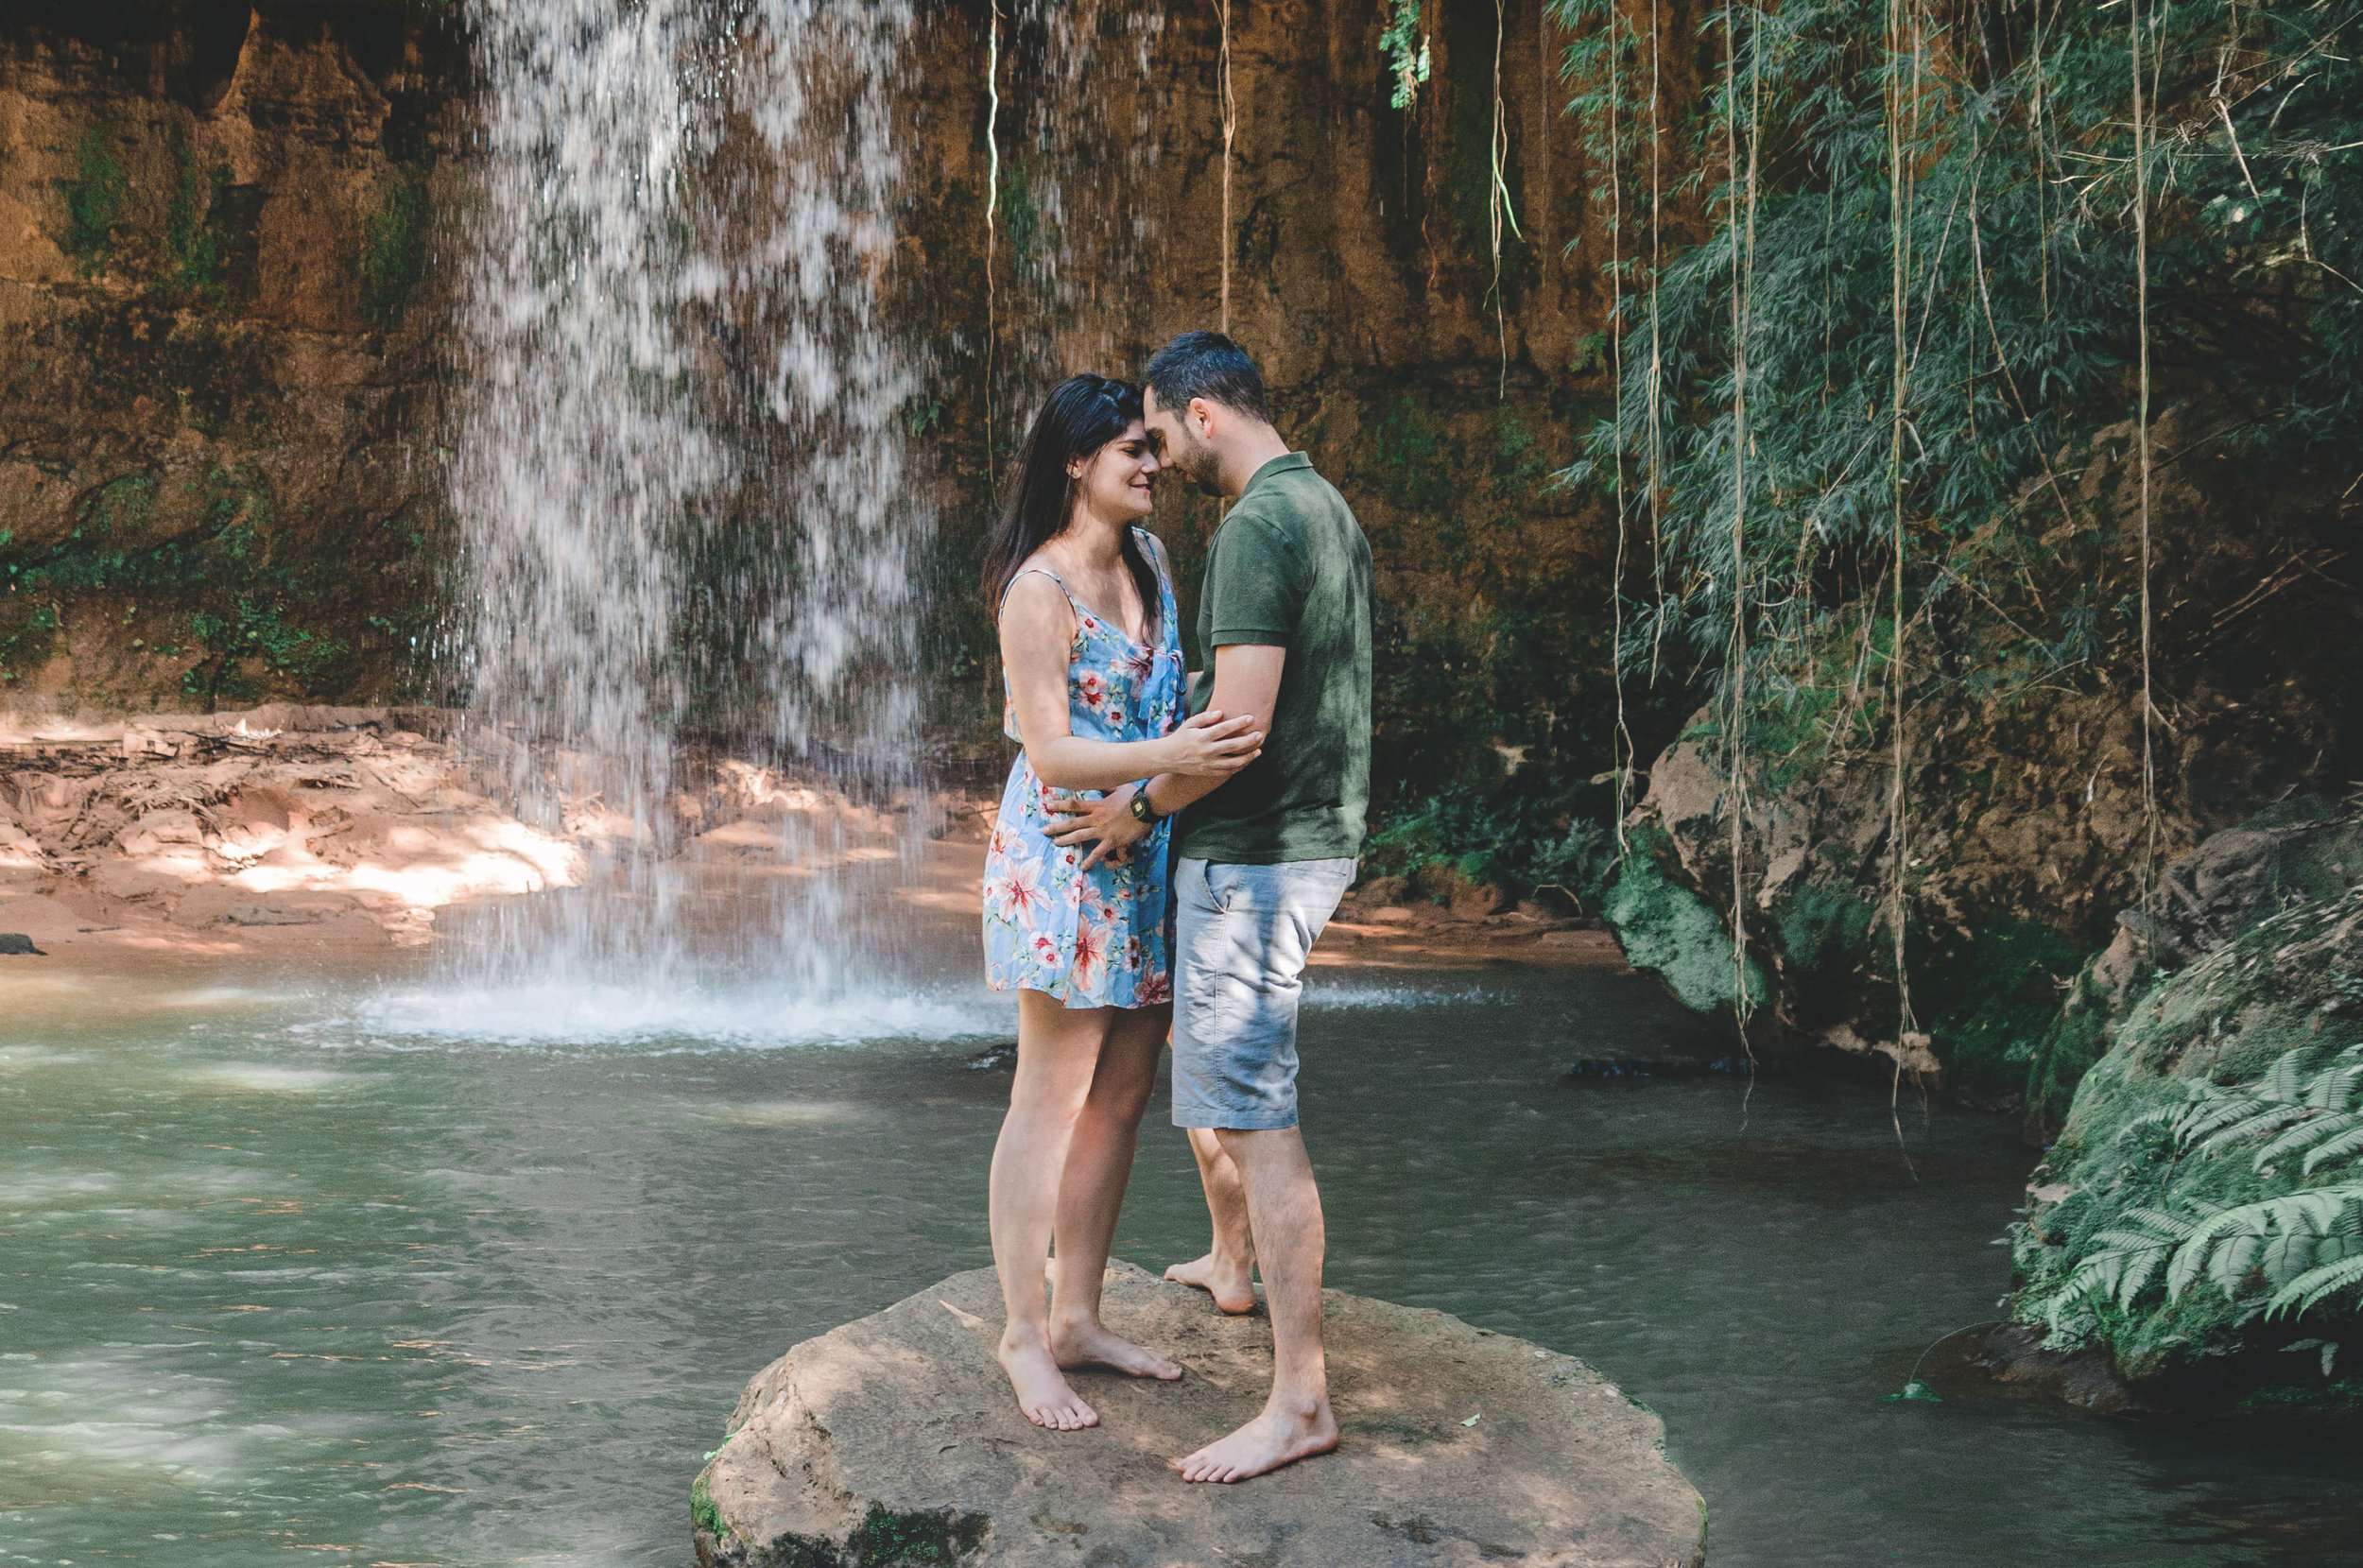 Destination wedding adventure photographer Iceland Hawaii Brazil waterfall David and Gabriela (11).jpg